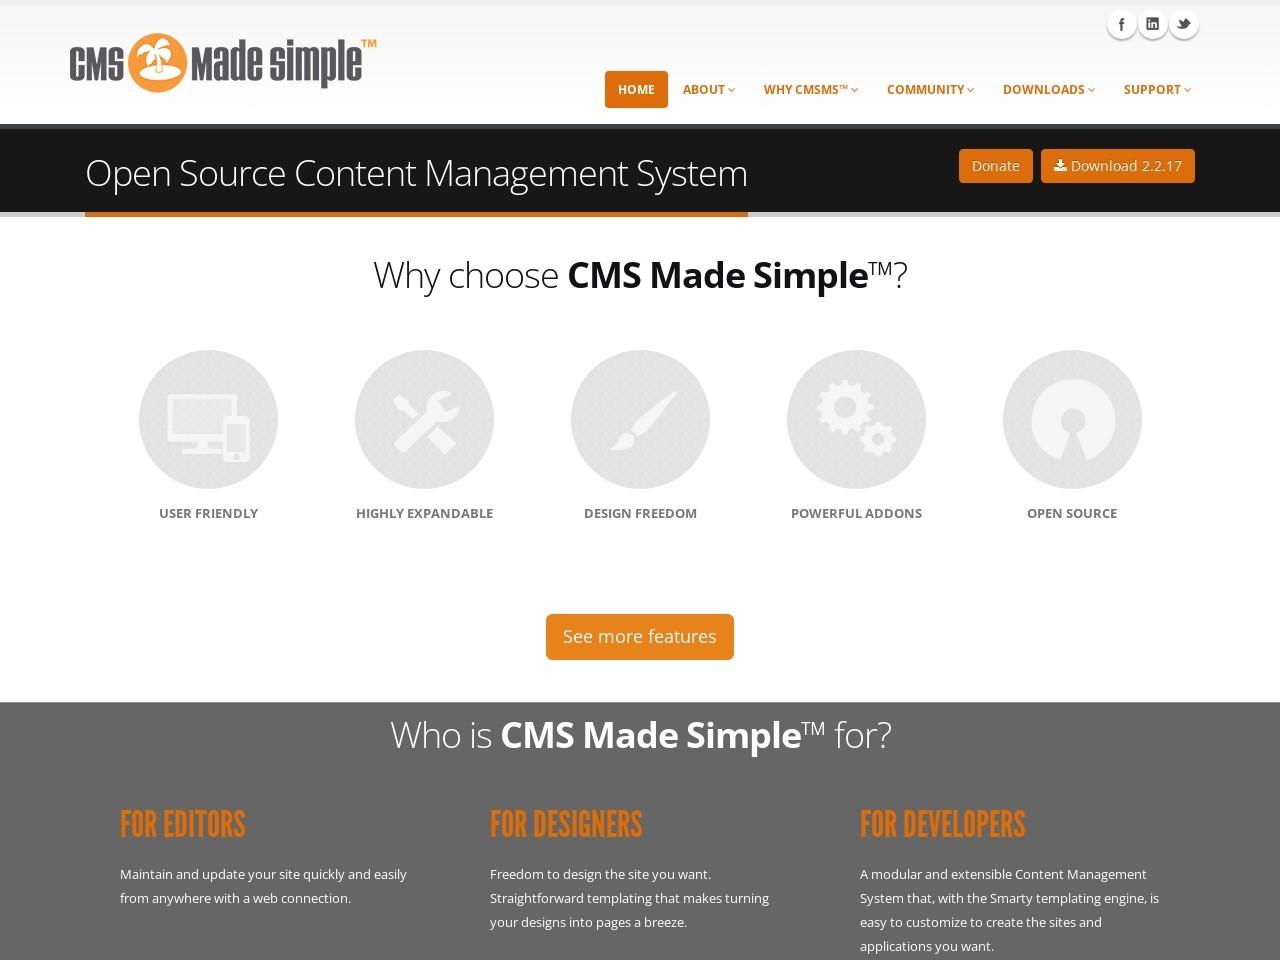 CMS Made Simple